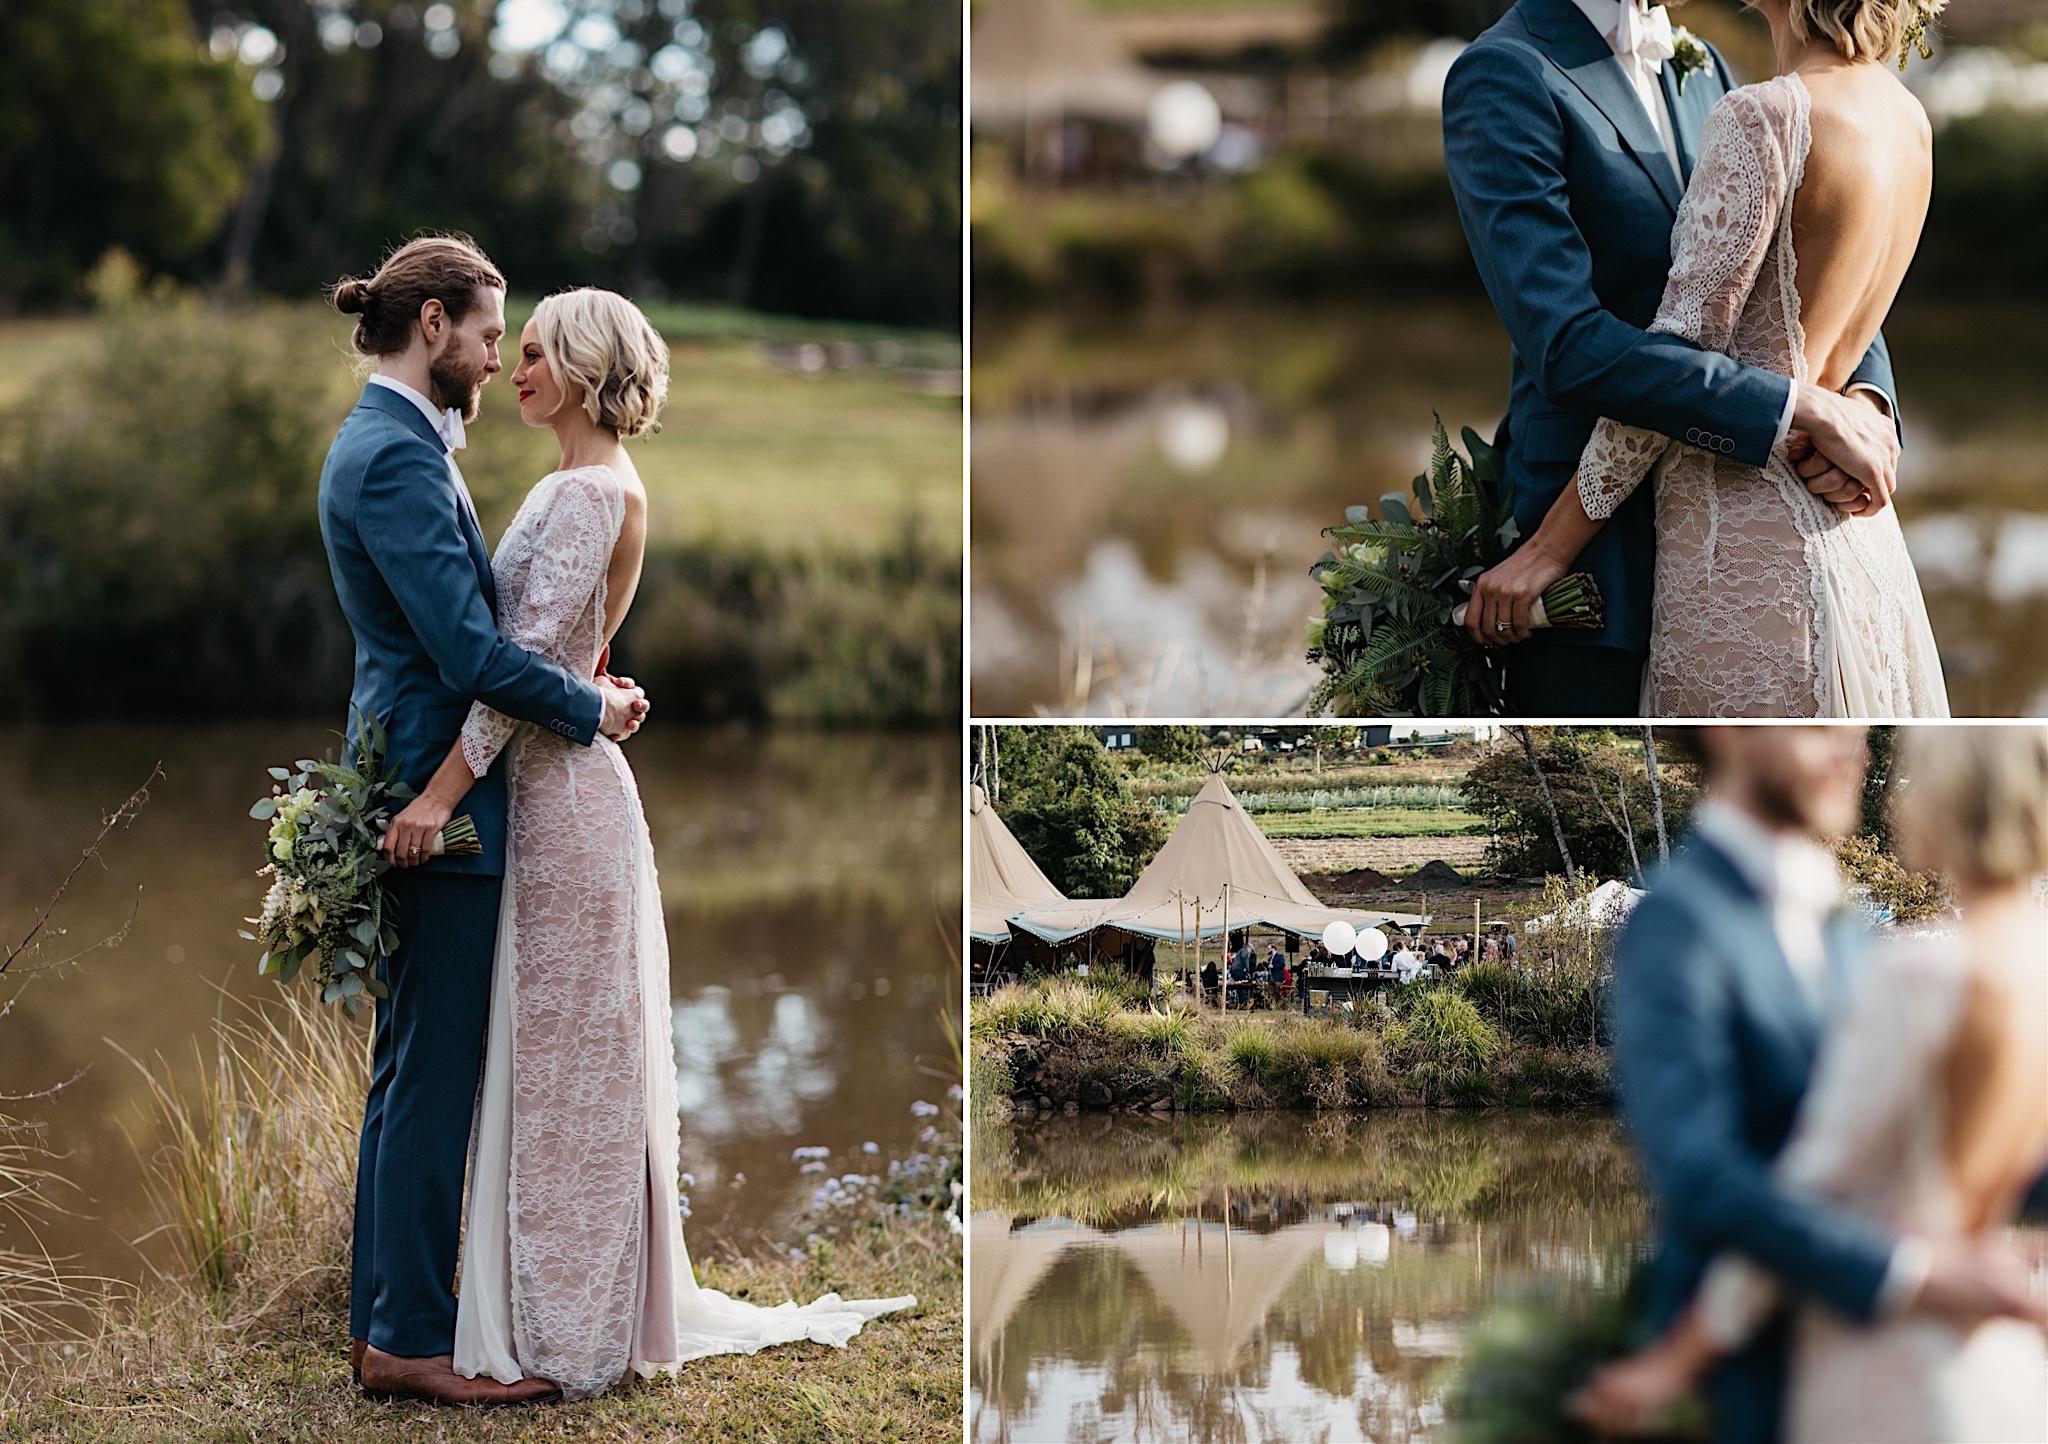 068_SBA-Jen-Tom-Wedding-232_SBA-Jen-Tom-Wedding-234_SBA-Jen-Tom-Wedding-231.jpg